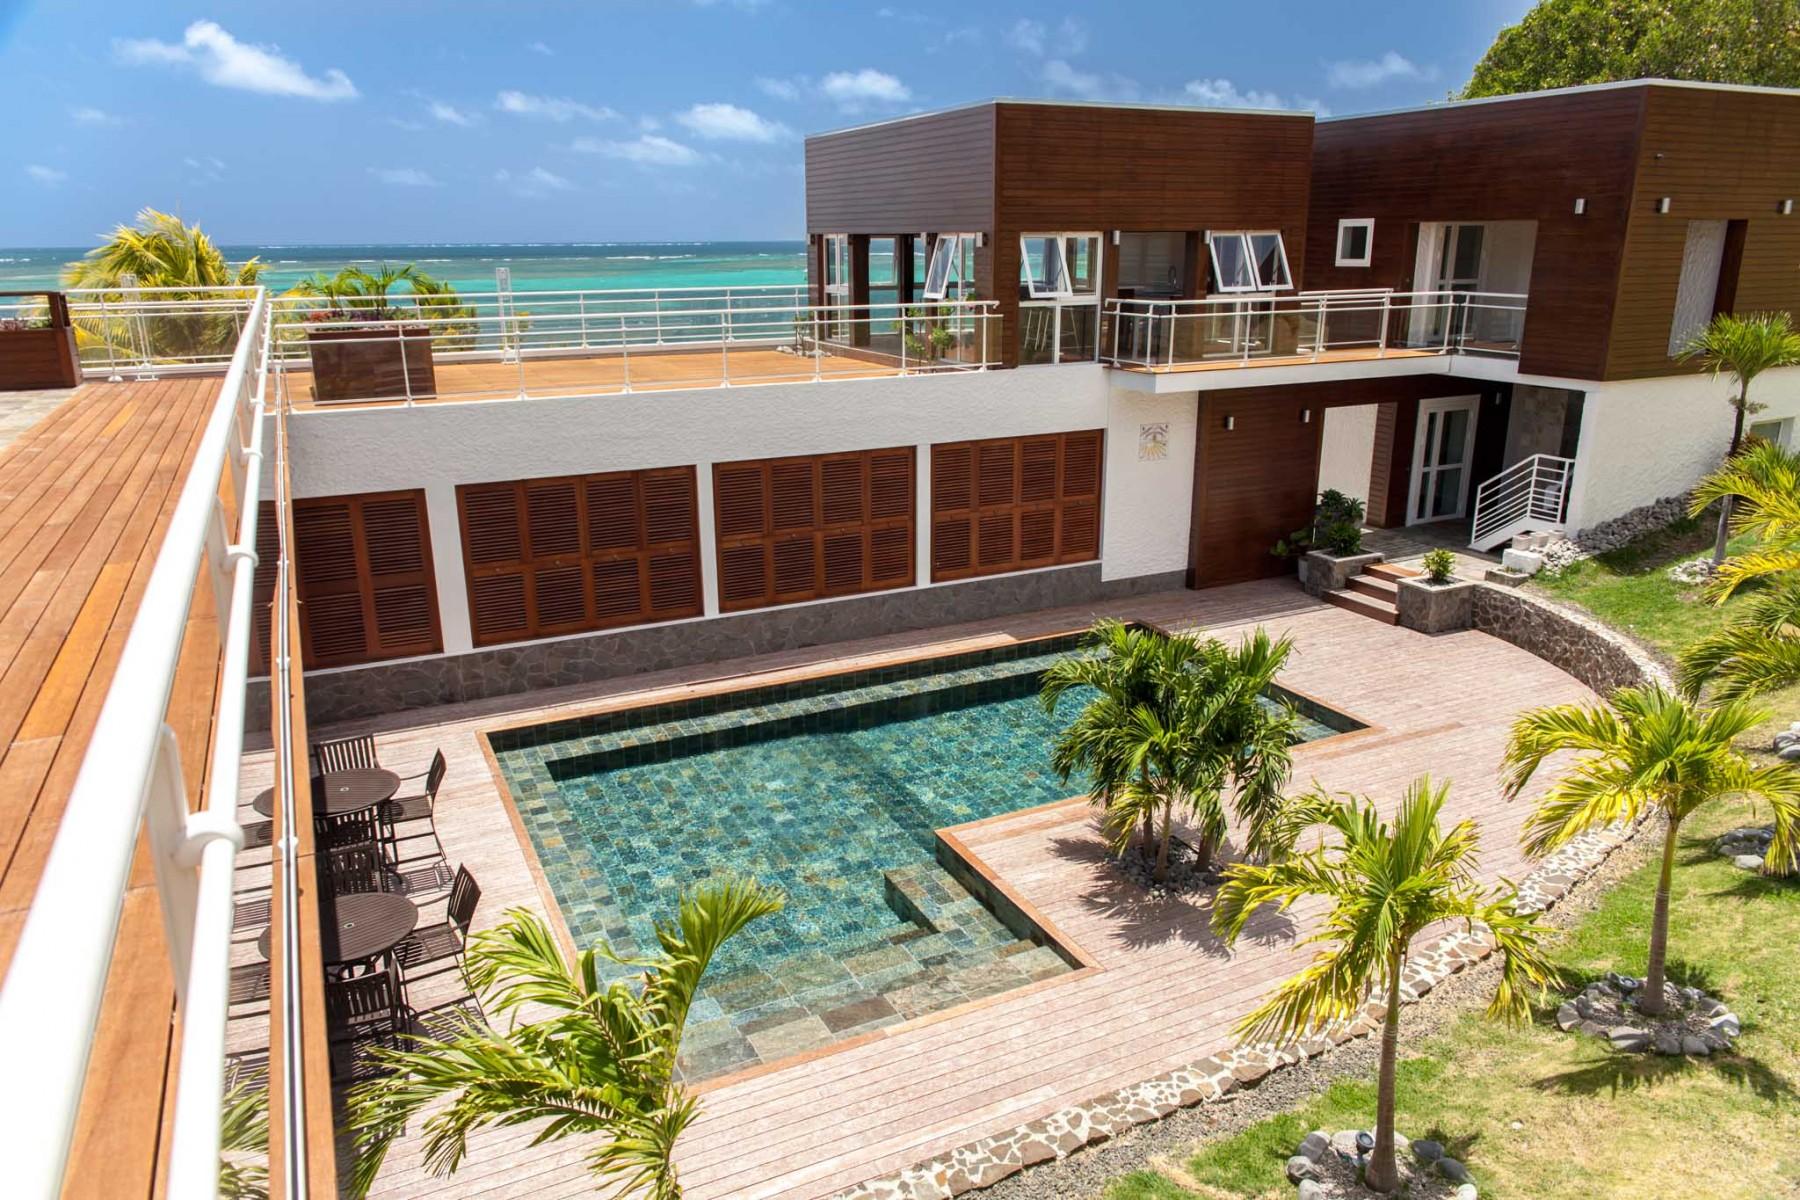 villa isabelle martinique 9 ch location villa luxe au. Black Bedroom Furniture Sets. Home Design Ideas